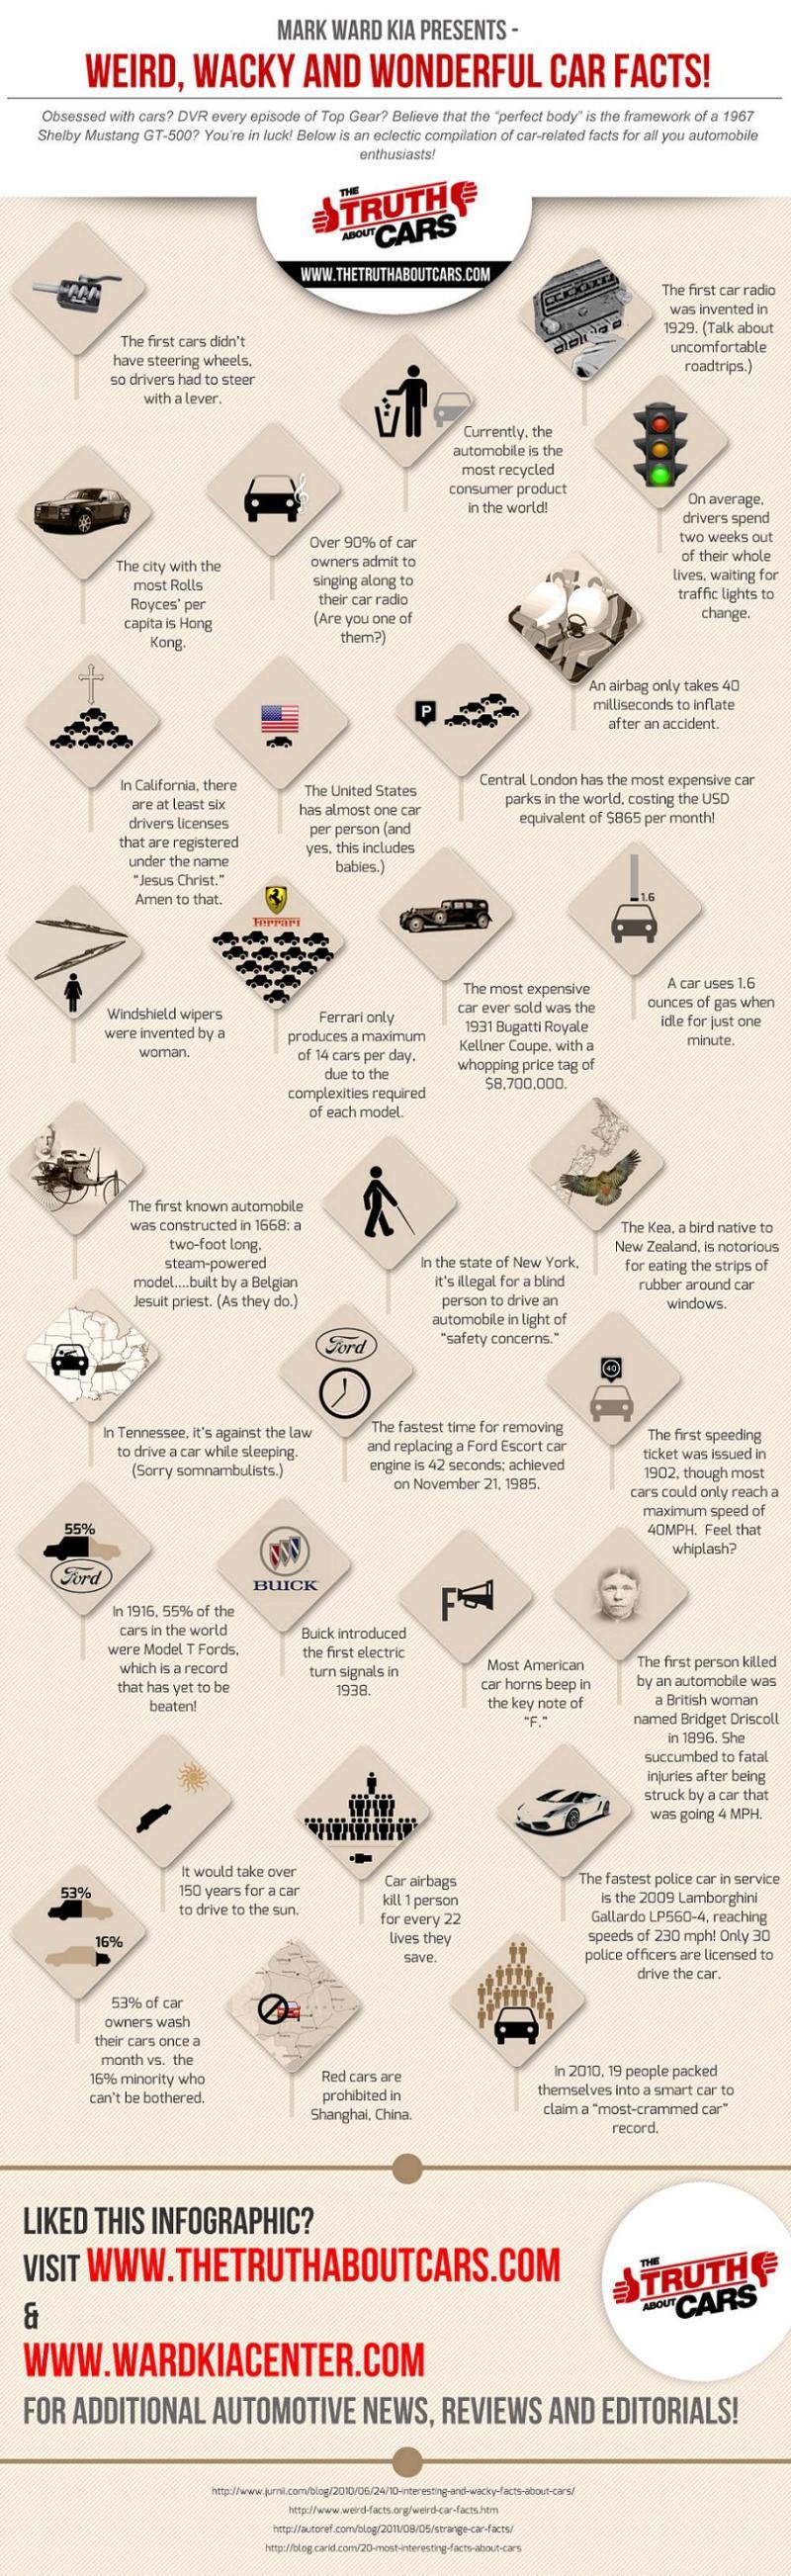 Weird , Wacky And Wonderful Car Facts !